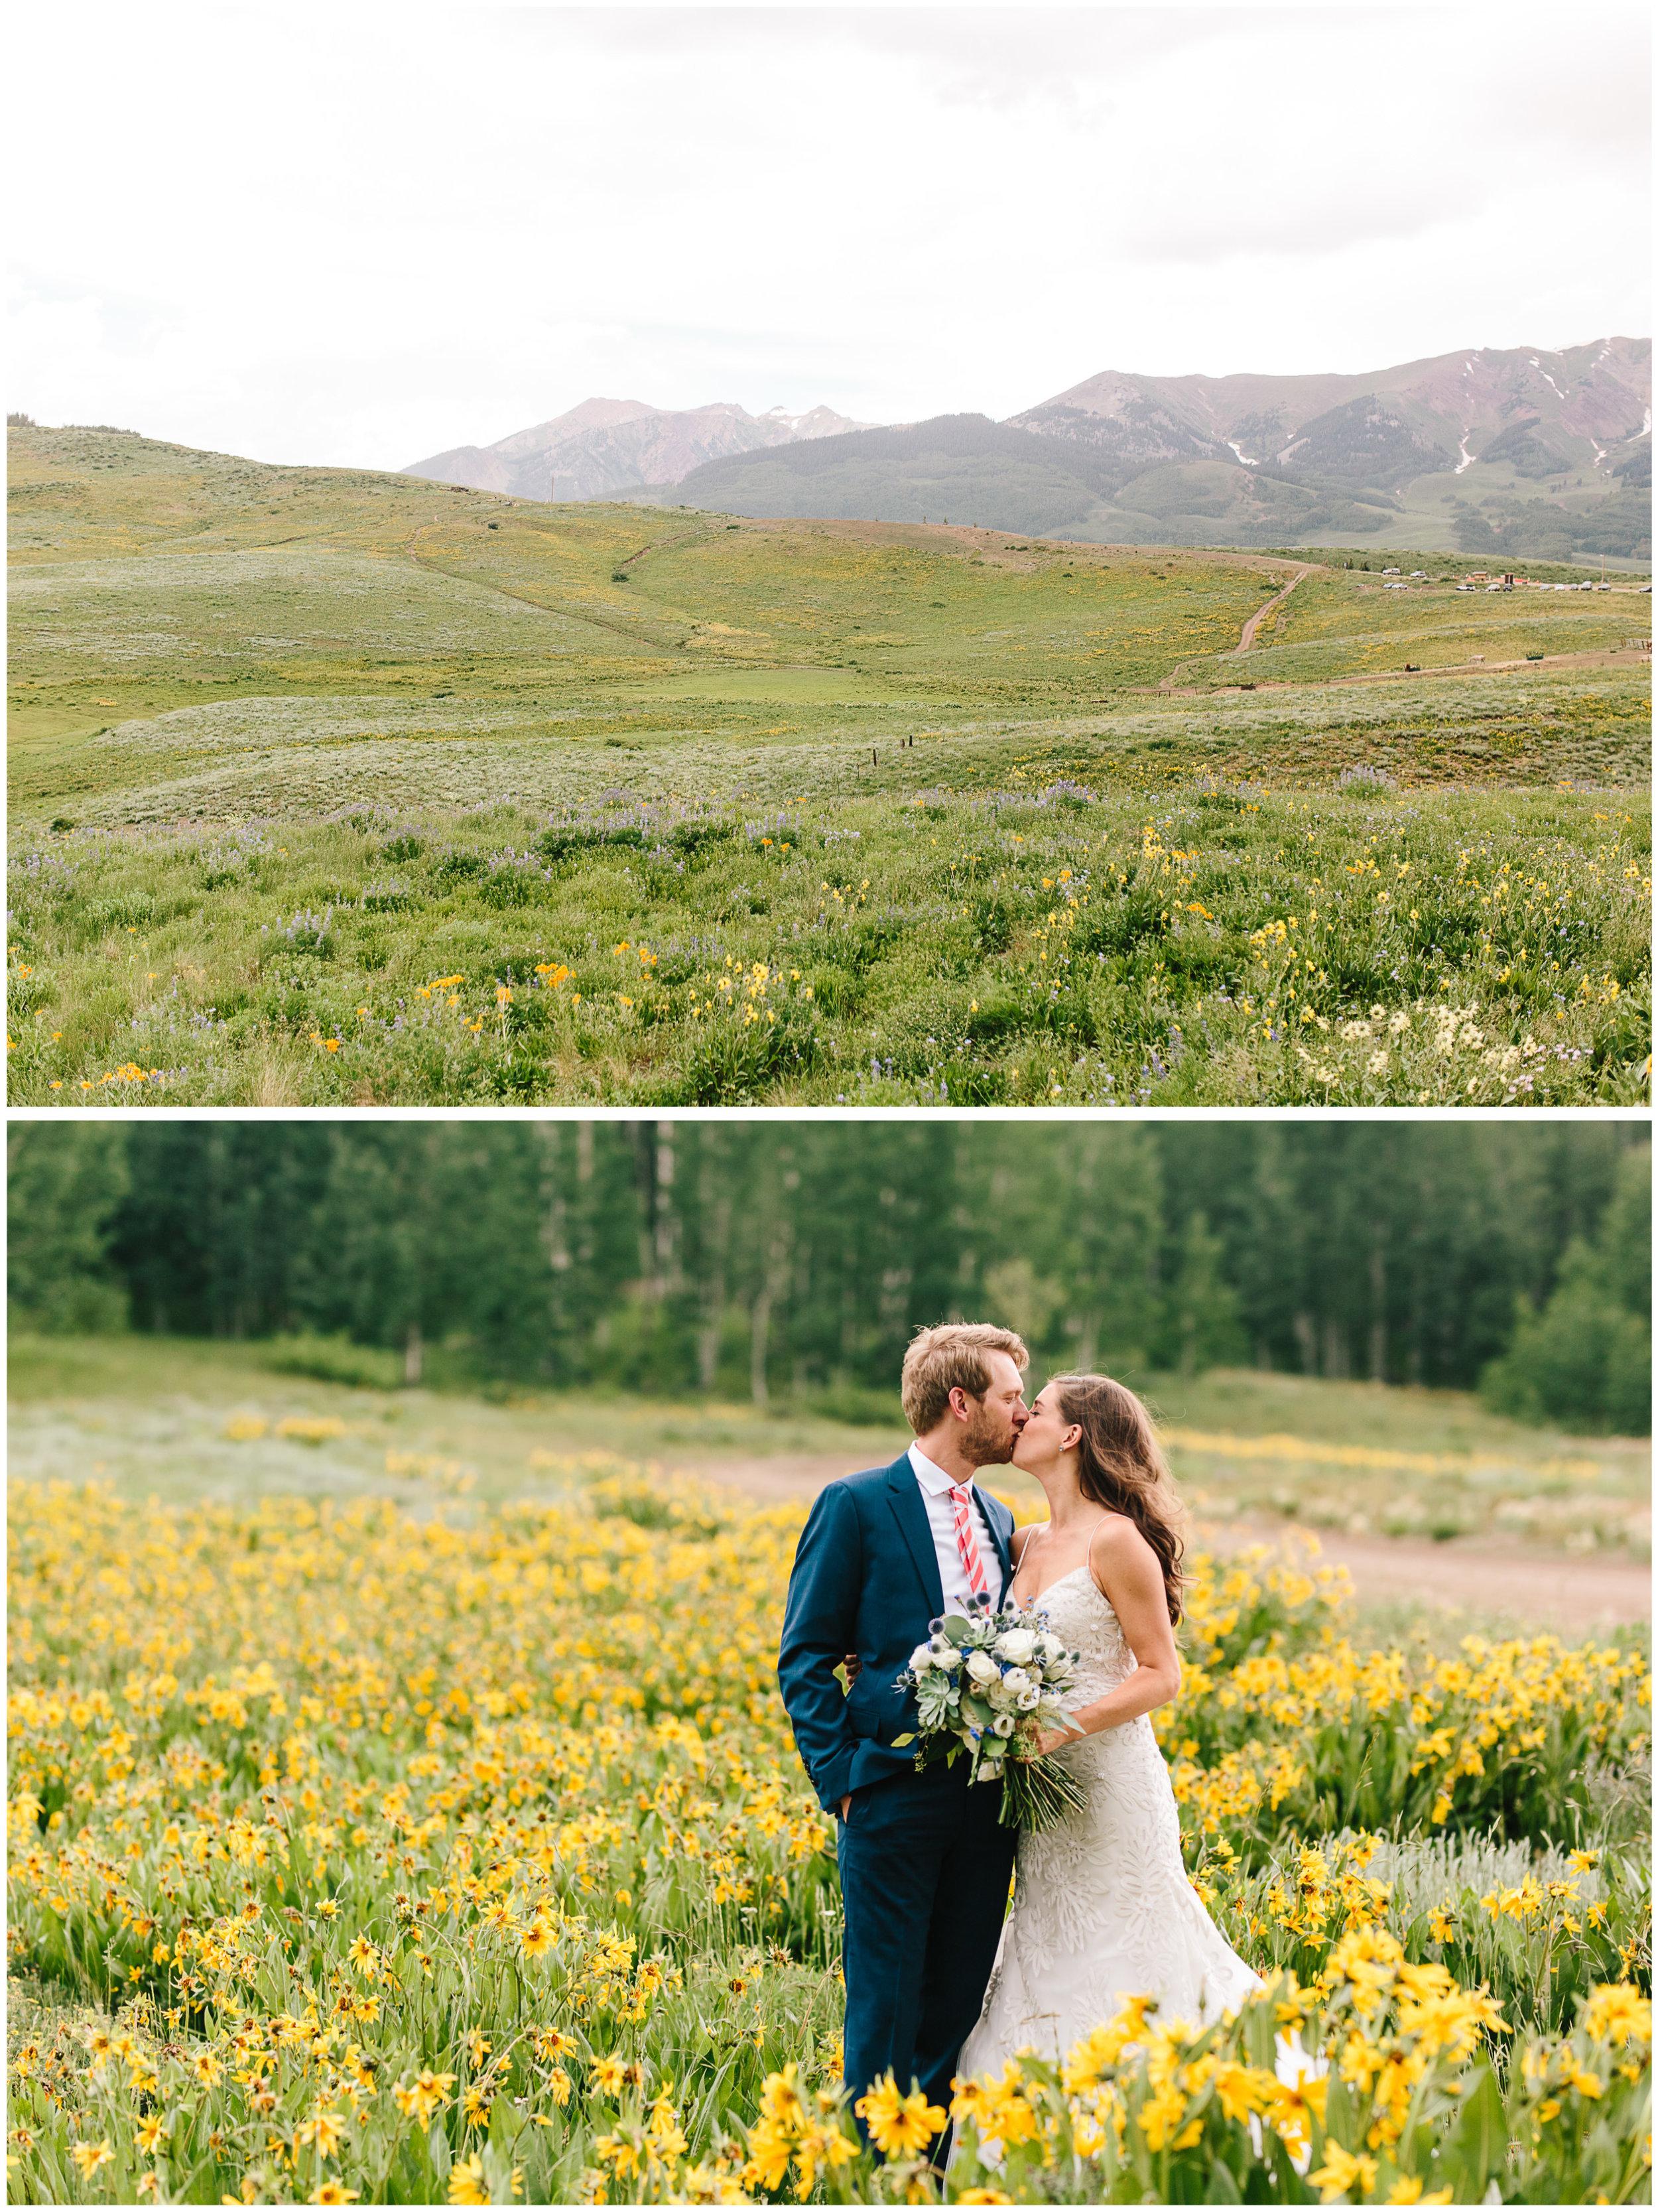 crested_butte_wedding_44.jpg